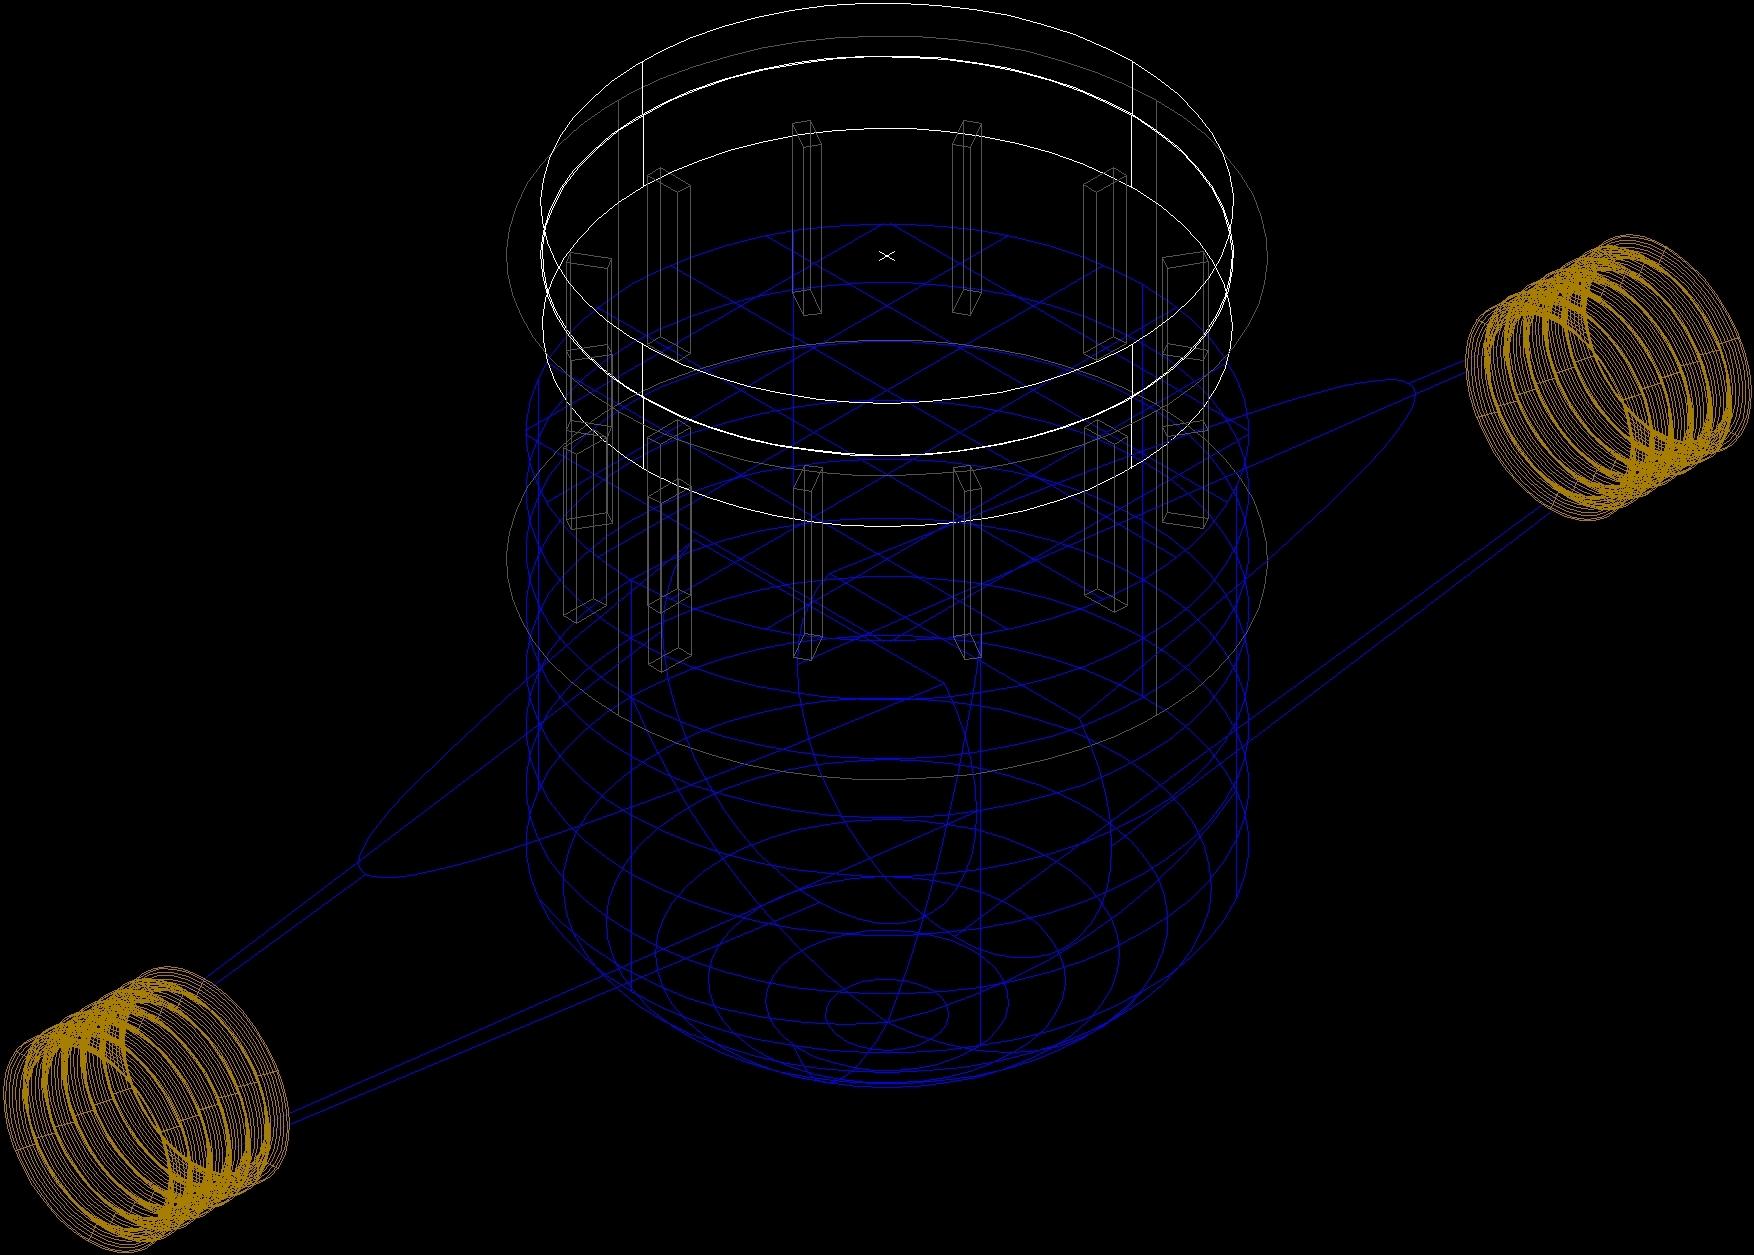 3d cad residential water meter model - Water Meter Tester Water 3d Dwg Model For Autocad